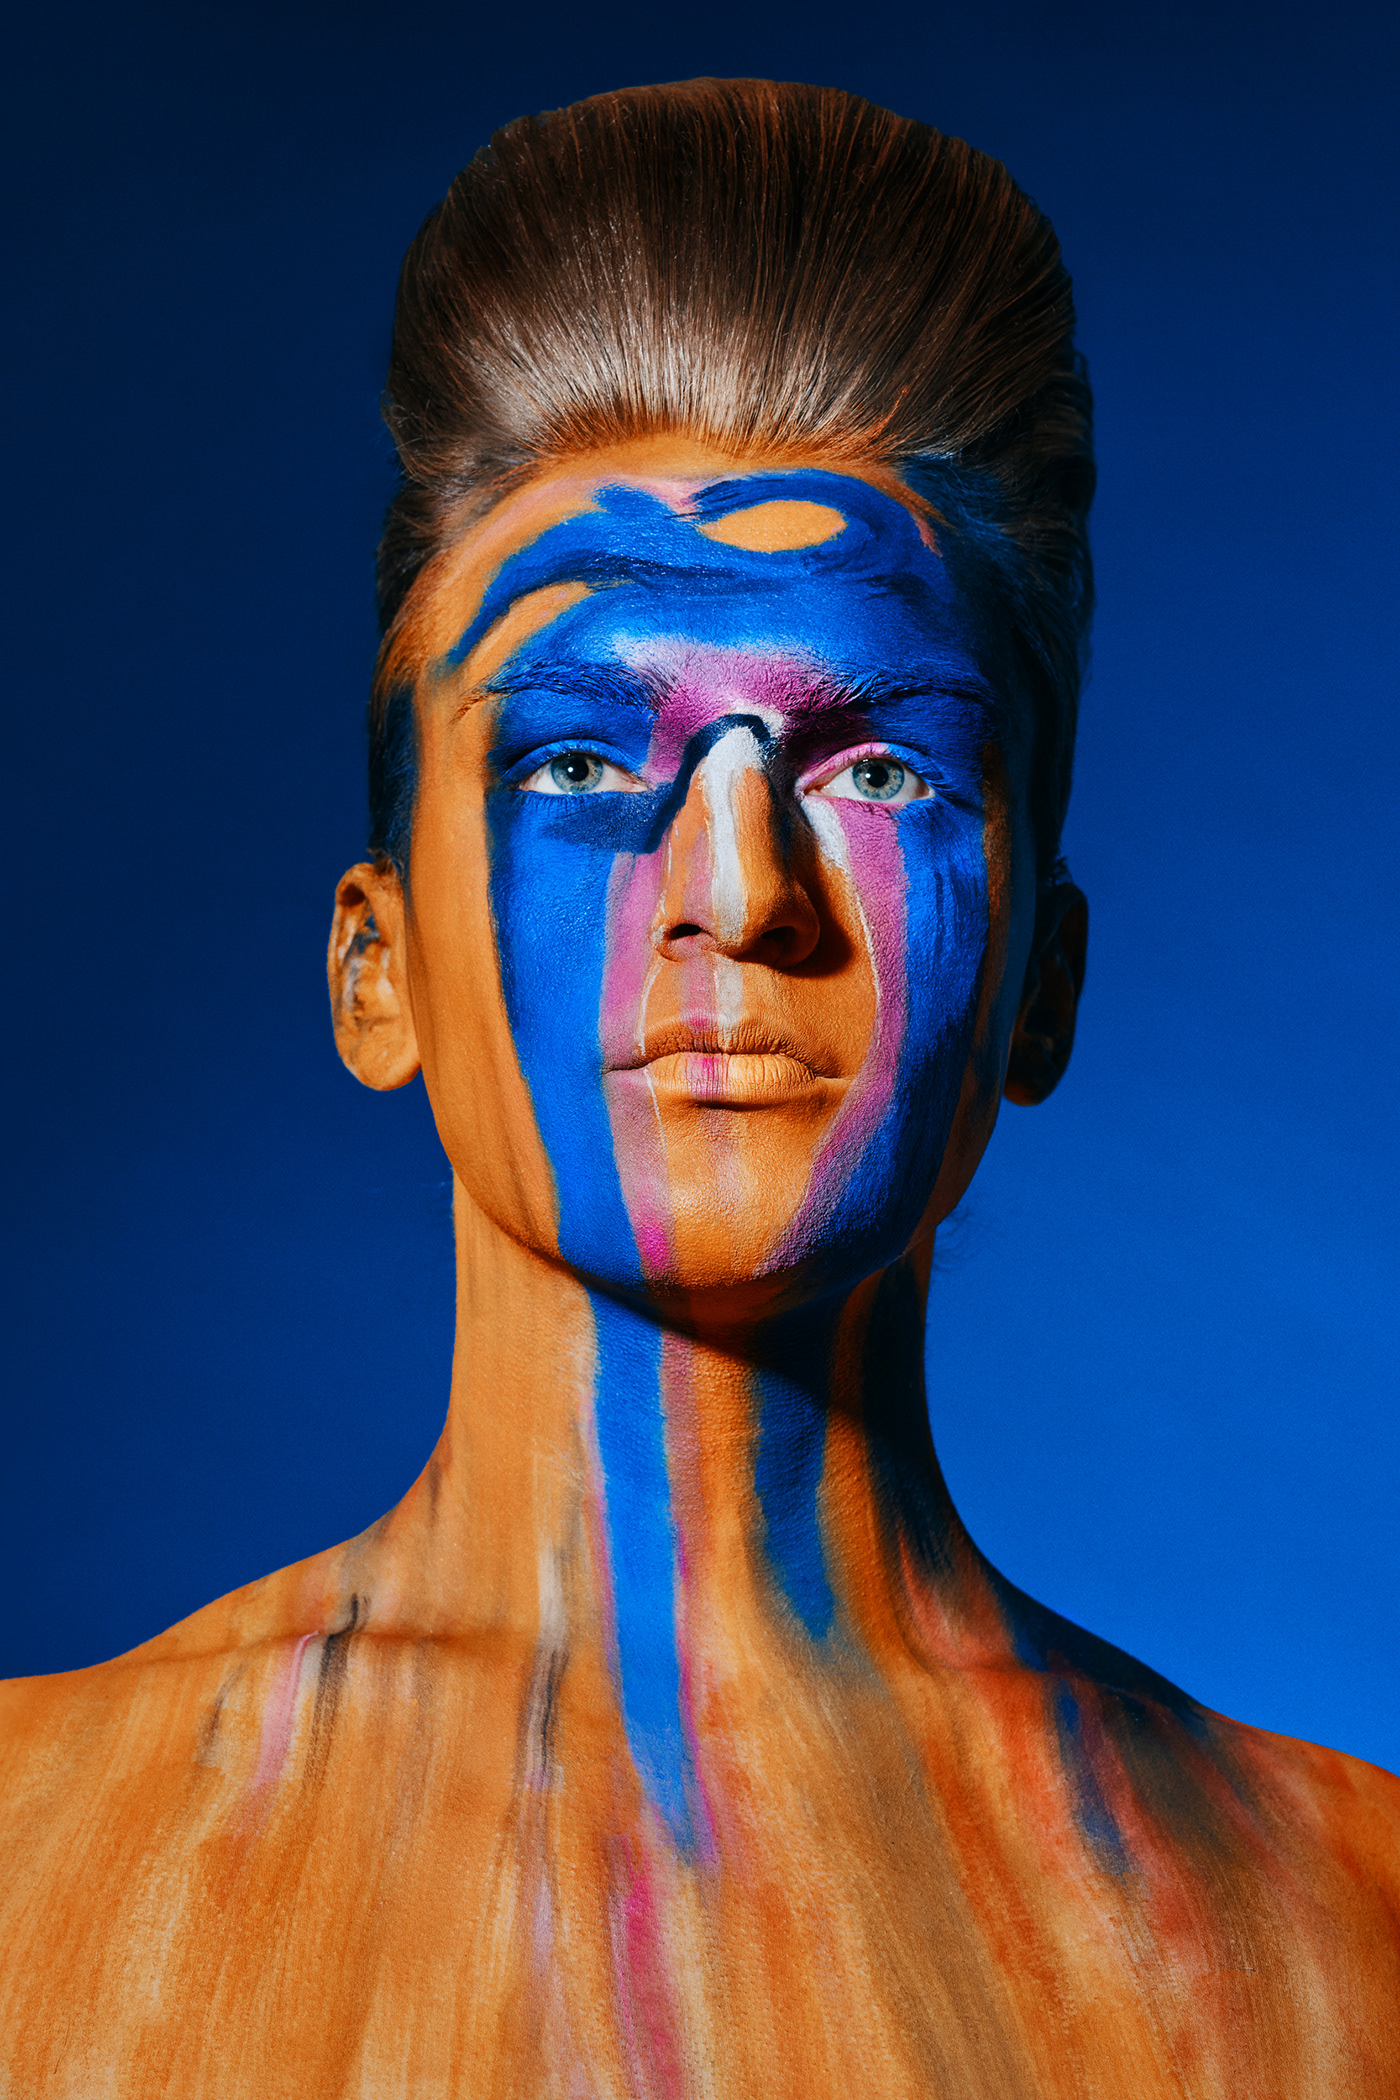 beauty editorial hairstyle magazine makeup model Photography  portrait studio video